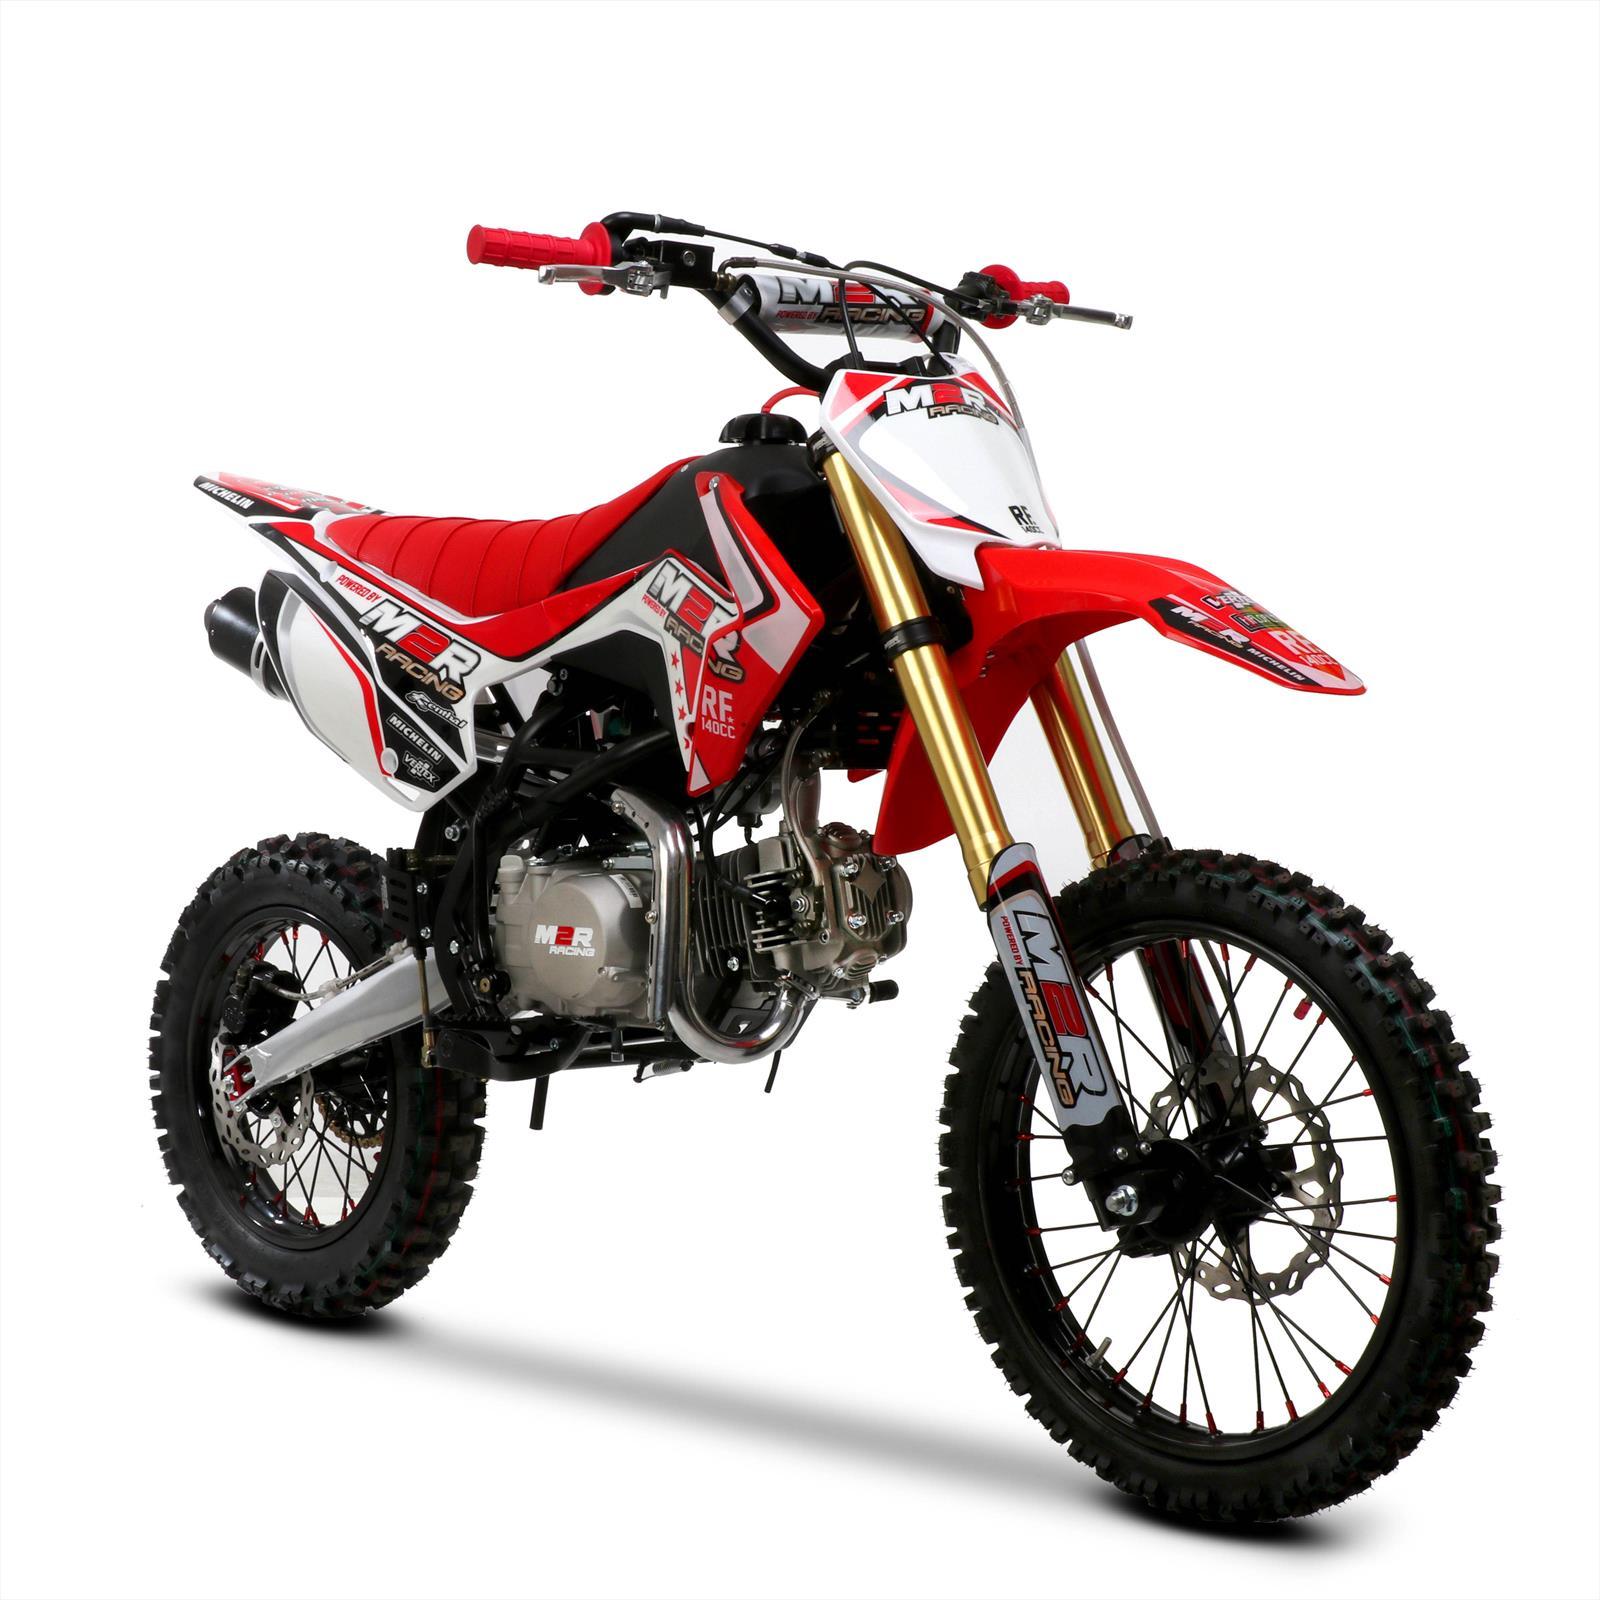 m2r racing rf140 s2 140cc 17 14 86cm red dirt bike. Black Bedroom Furniture Sets. Home Design Ideas